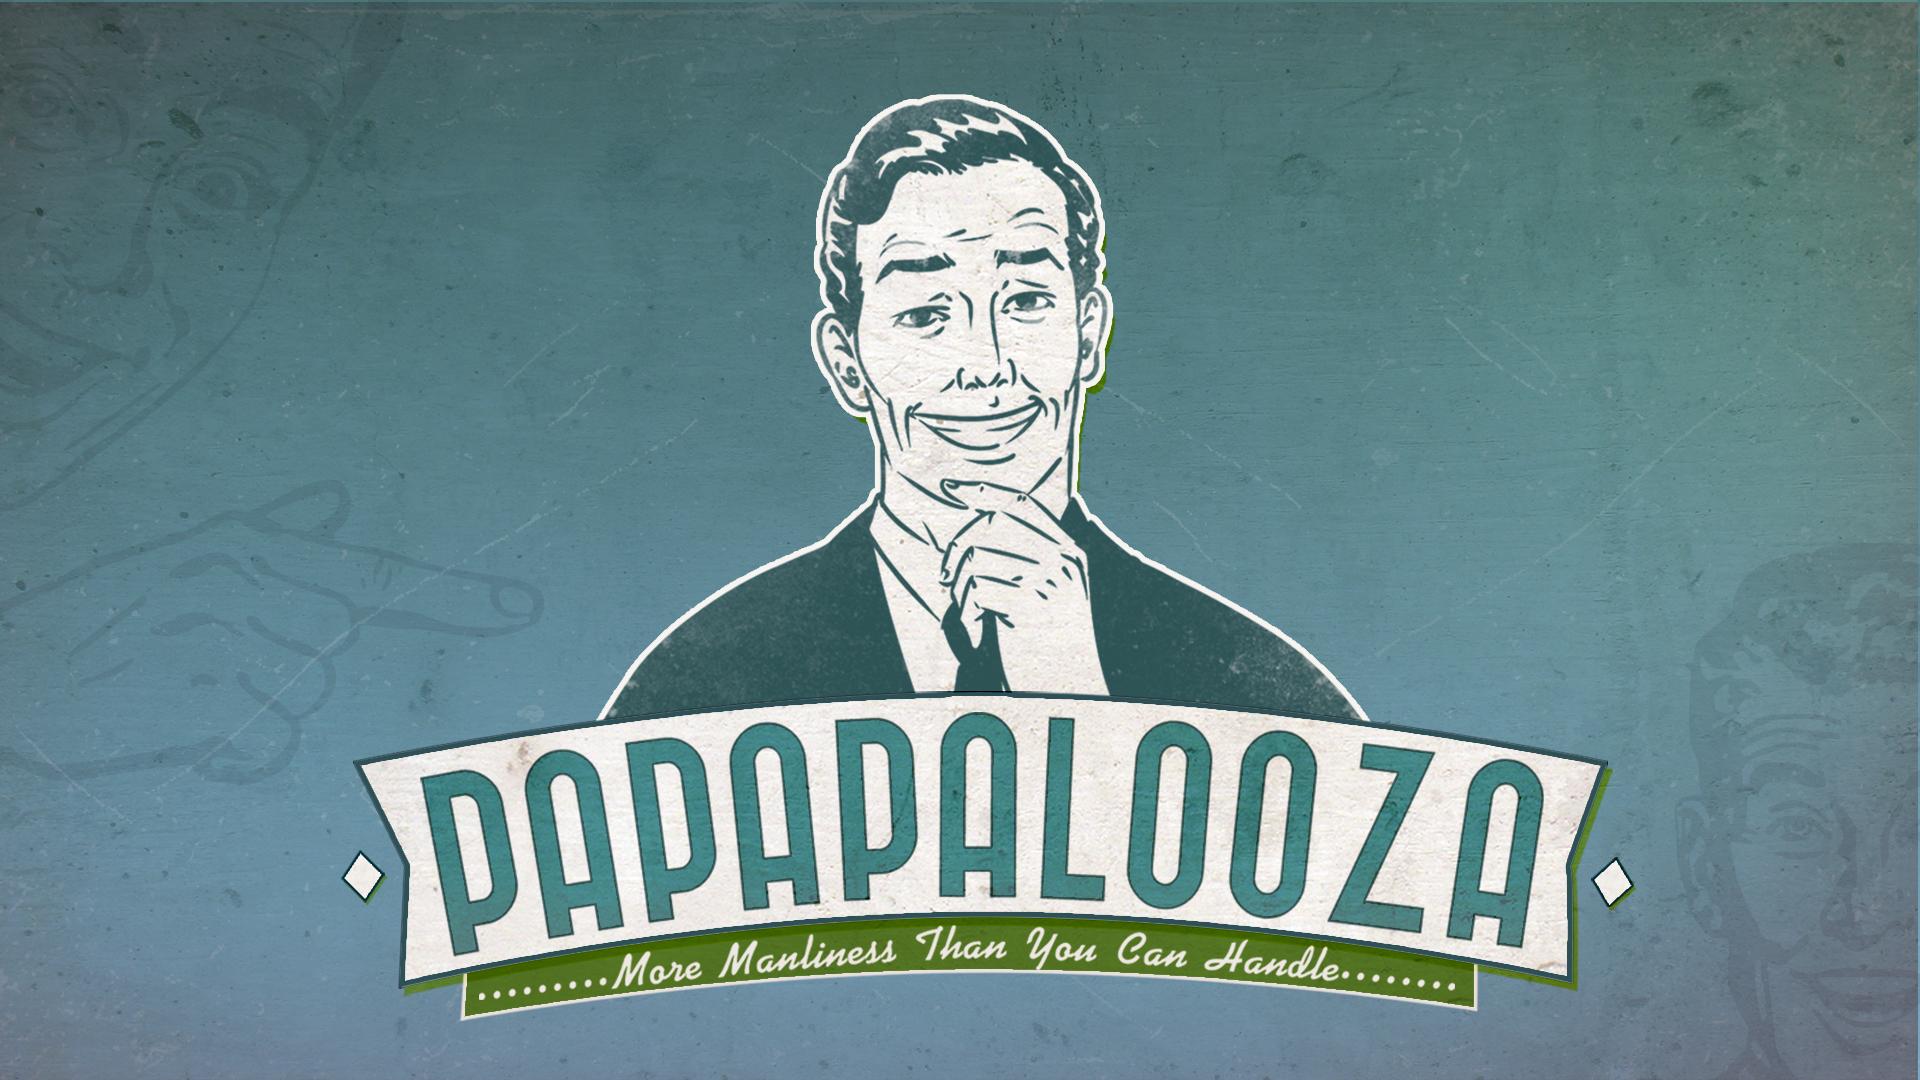 Papapalooza 1920 Logo.jpg